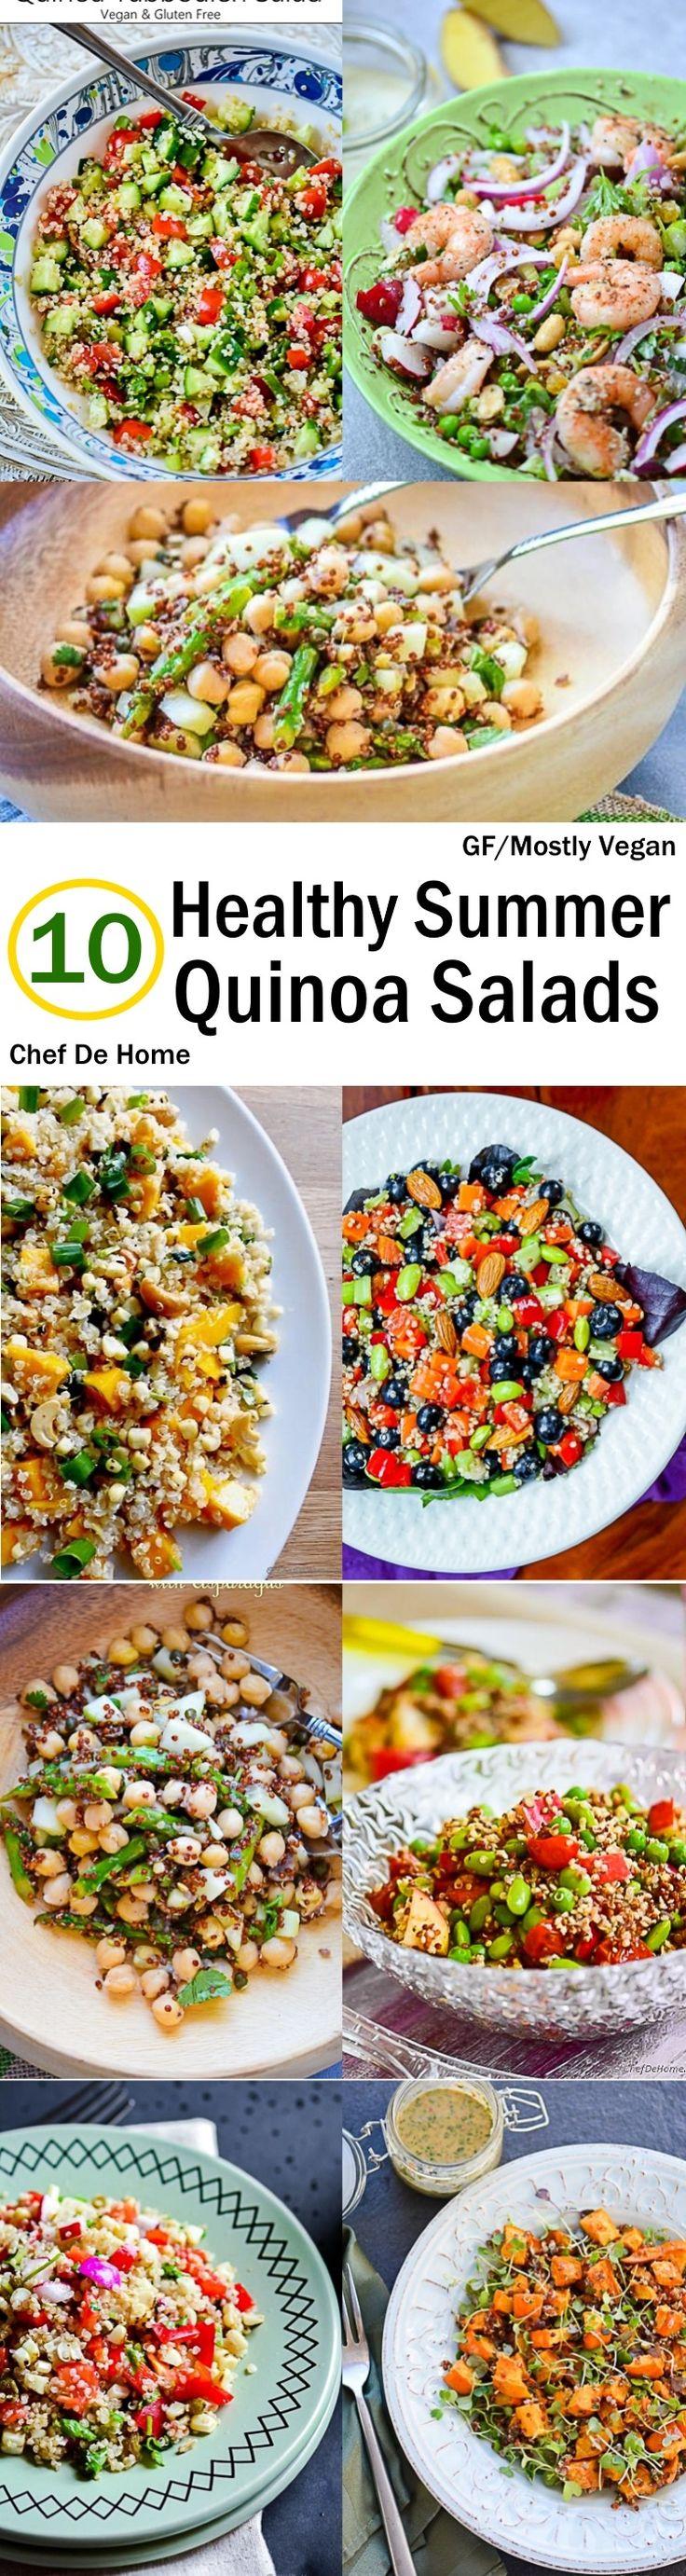 10 Healthy Quinoa Salads Meals | ChefDeHome.com